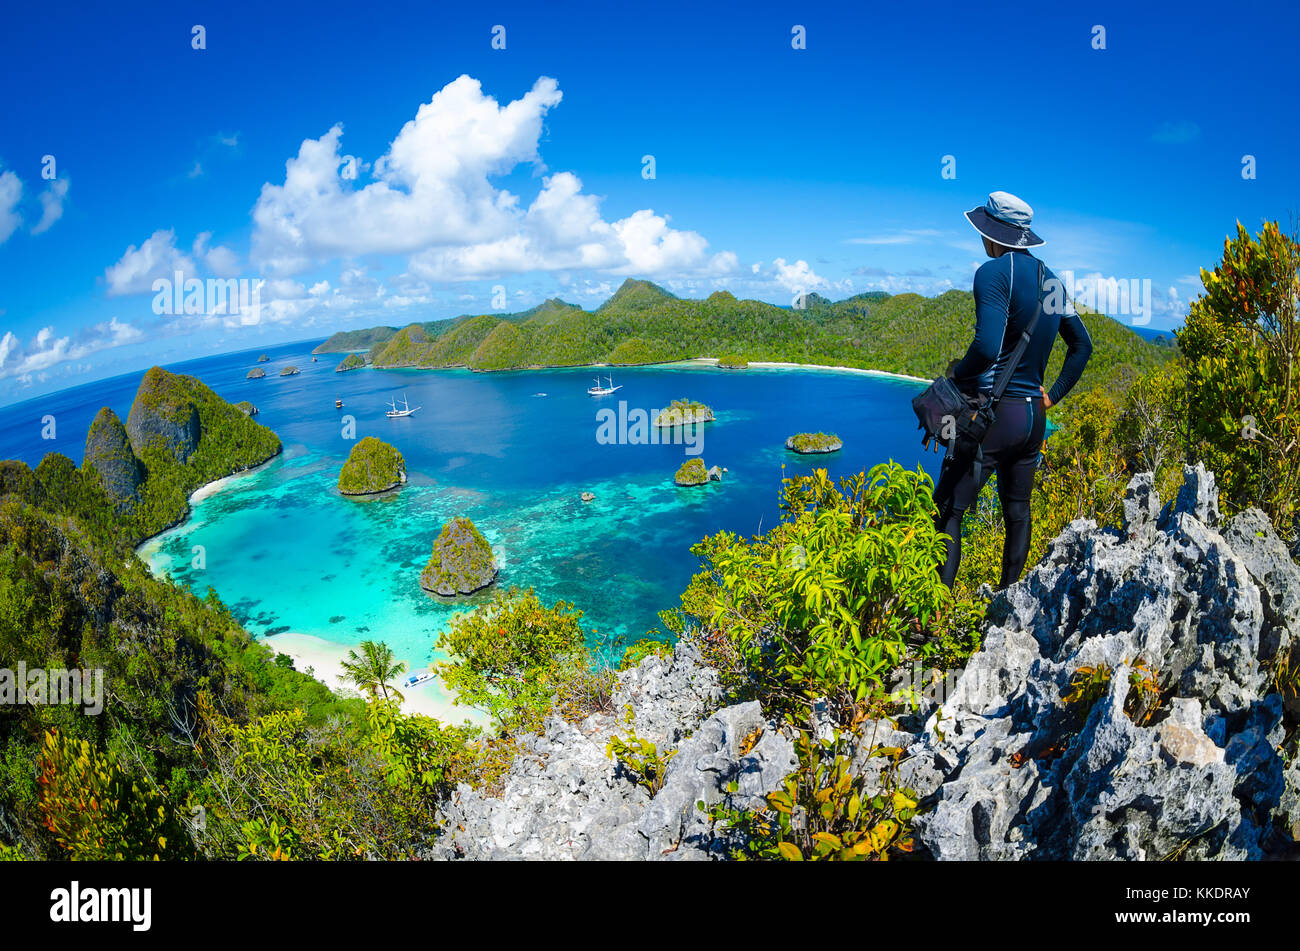 Wayag viewpoint, Raja Ampat, West Papua, Indonesia - Stock Image